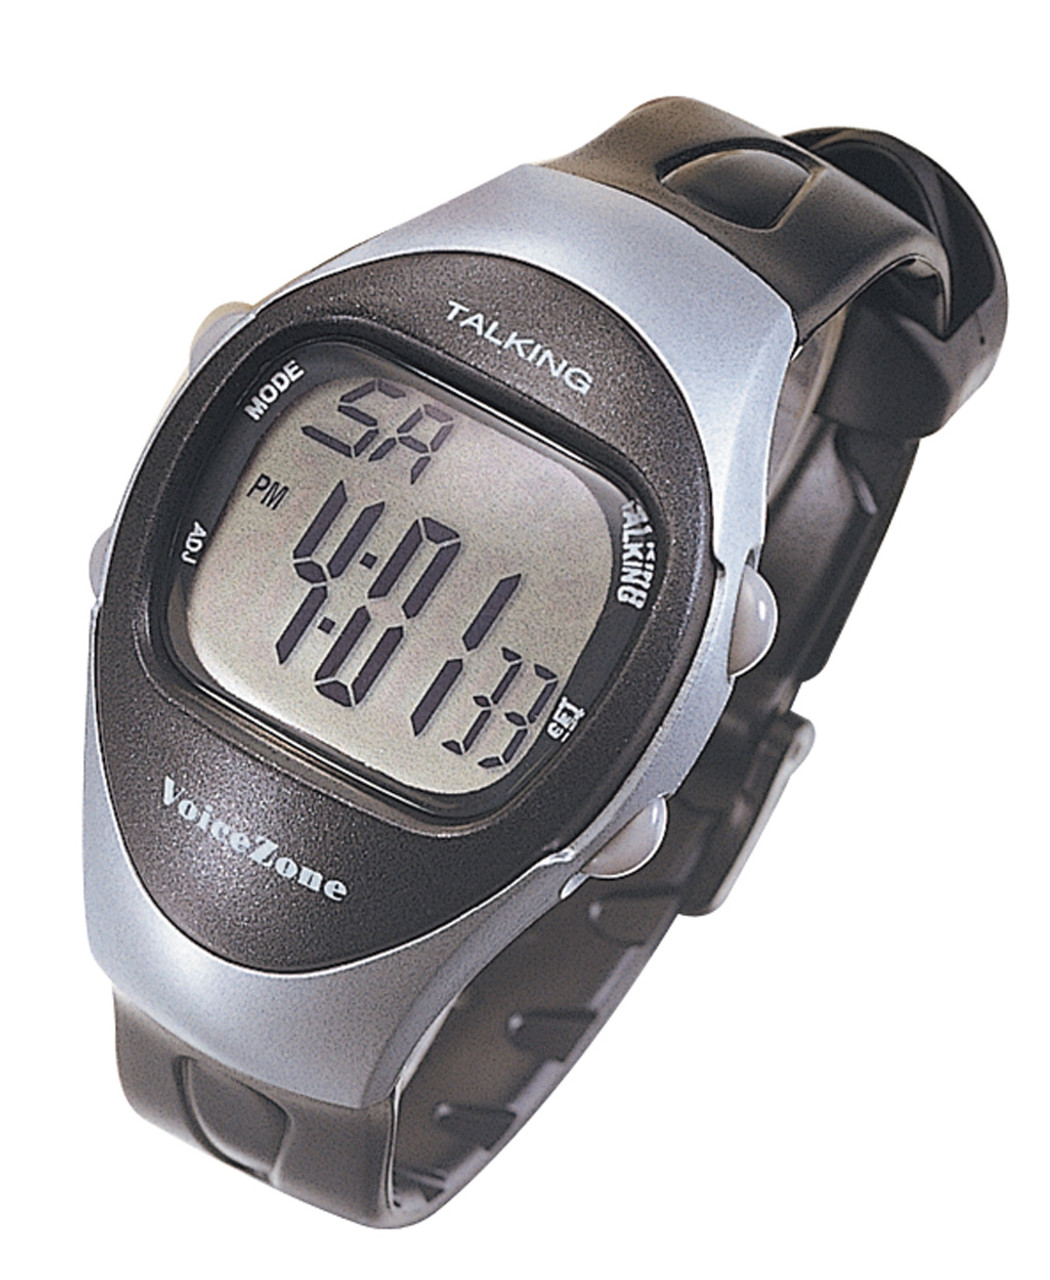 4 Alarm Talking Sport Watch with Stopwatch